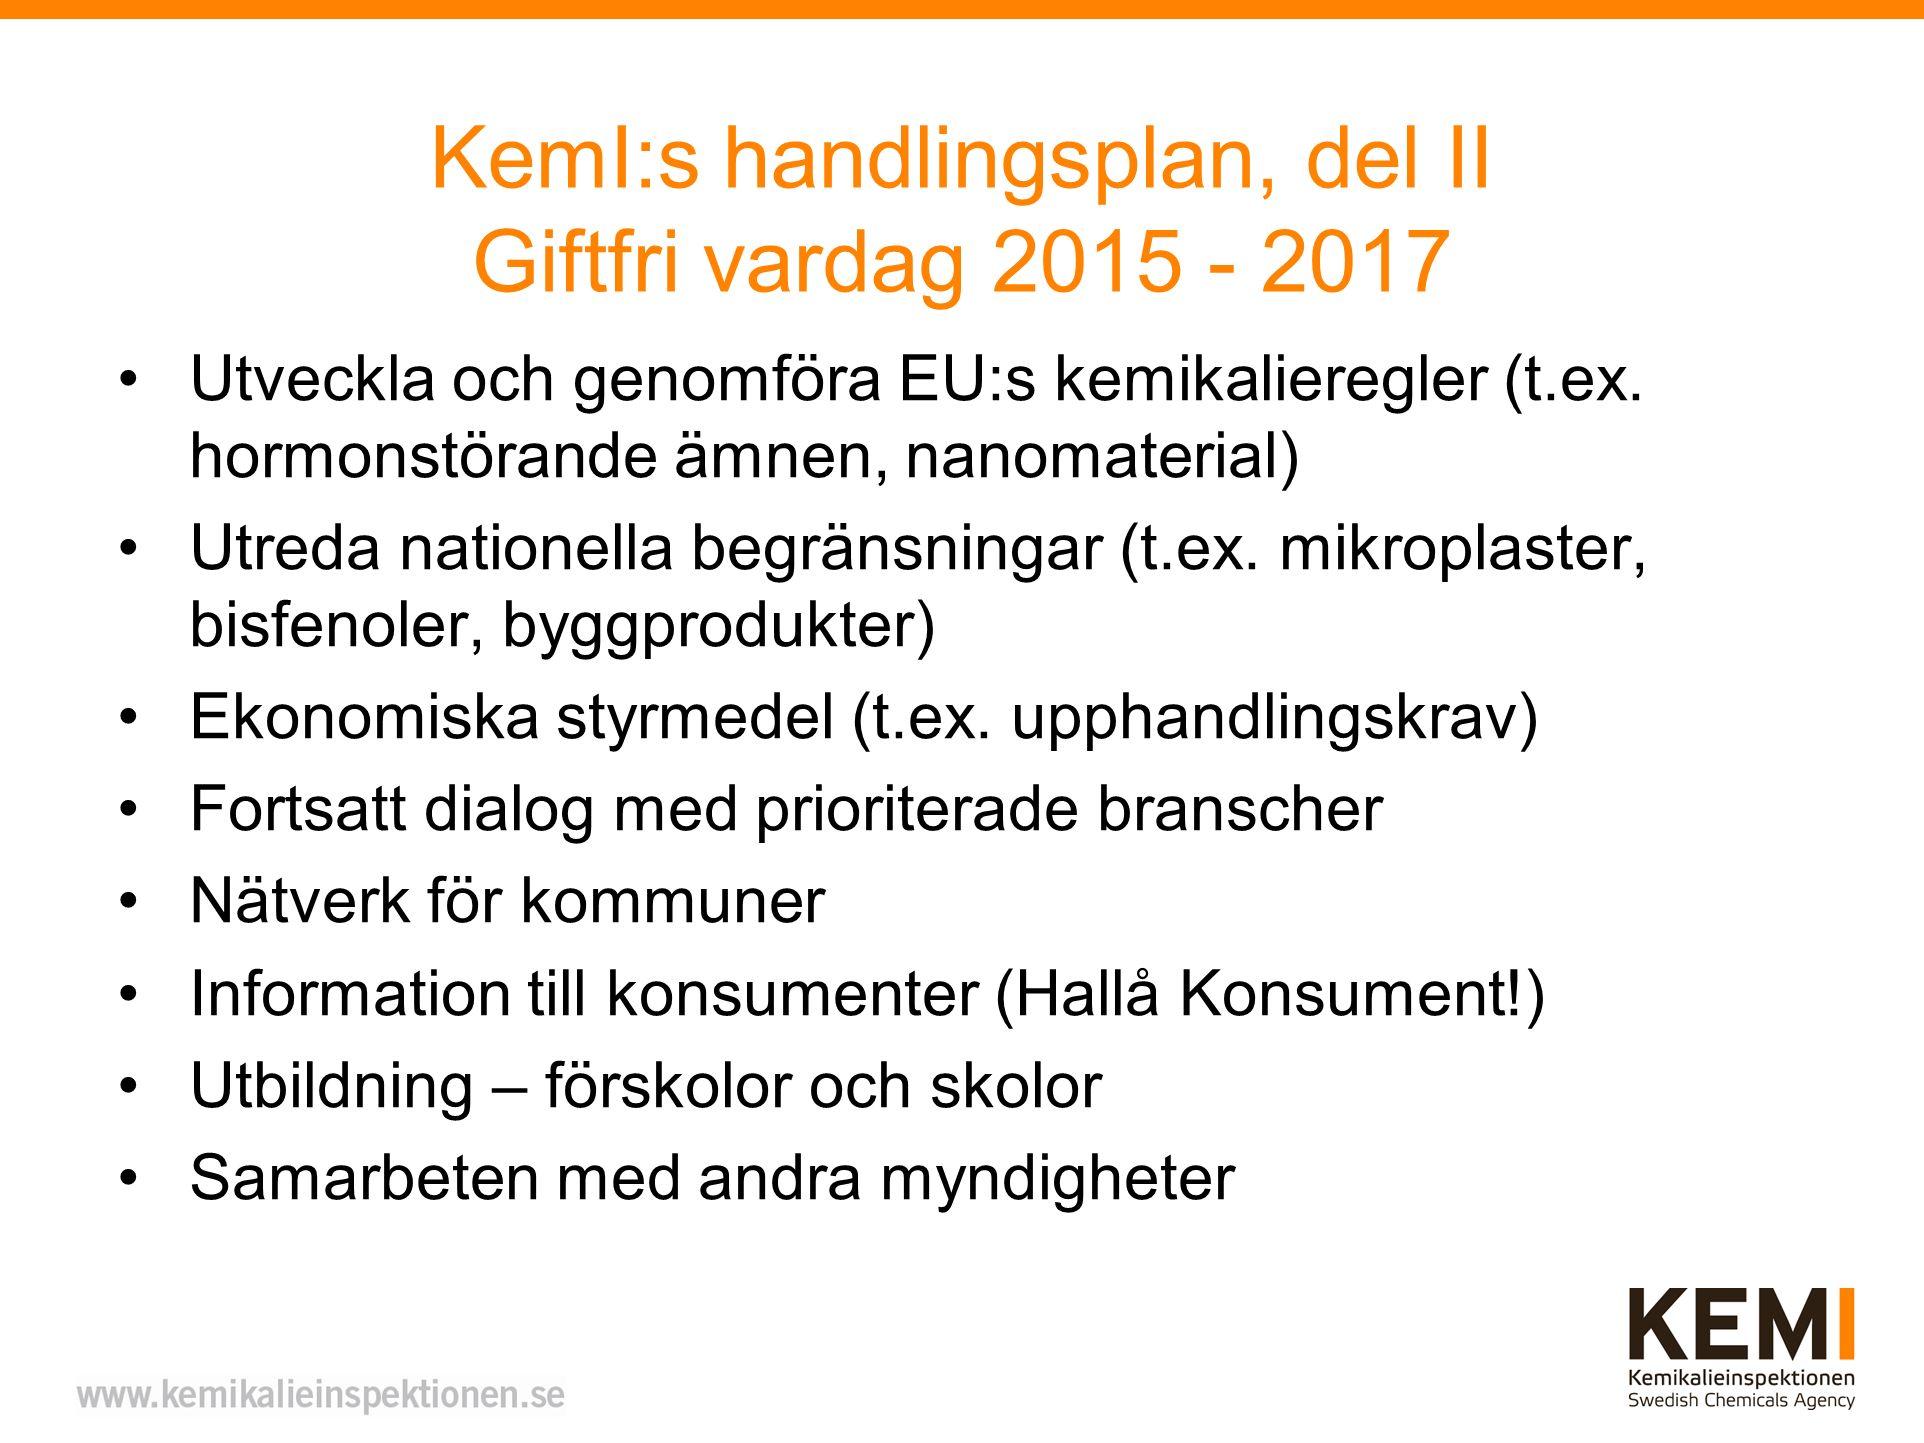 KemI:s handlingsplan, del II Giftfri vardag 2015 - 2017